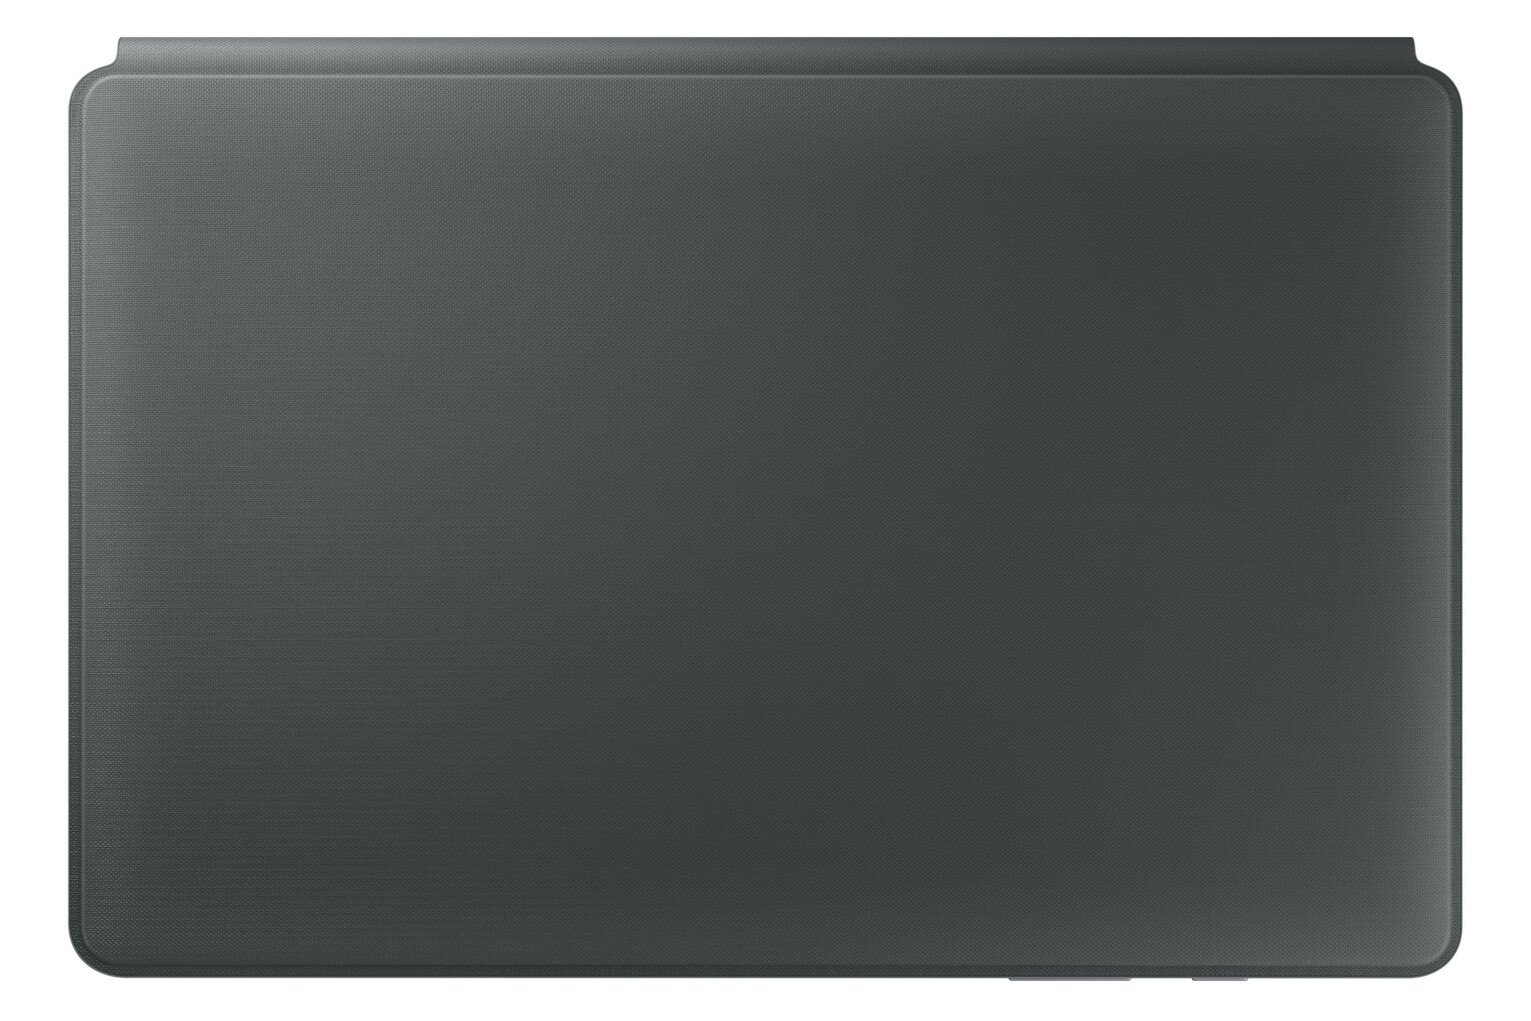 Samsung Galaxy Tab S6 Keyboard Book Cover - Black